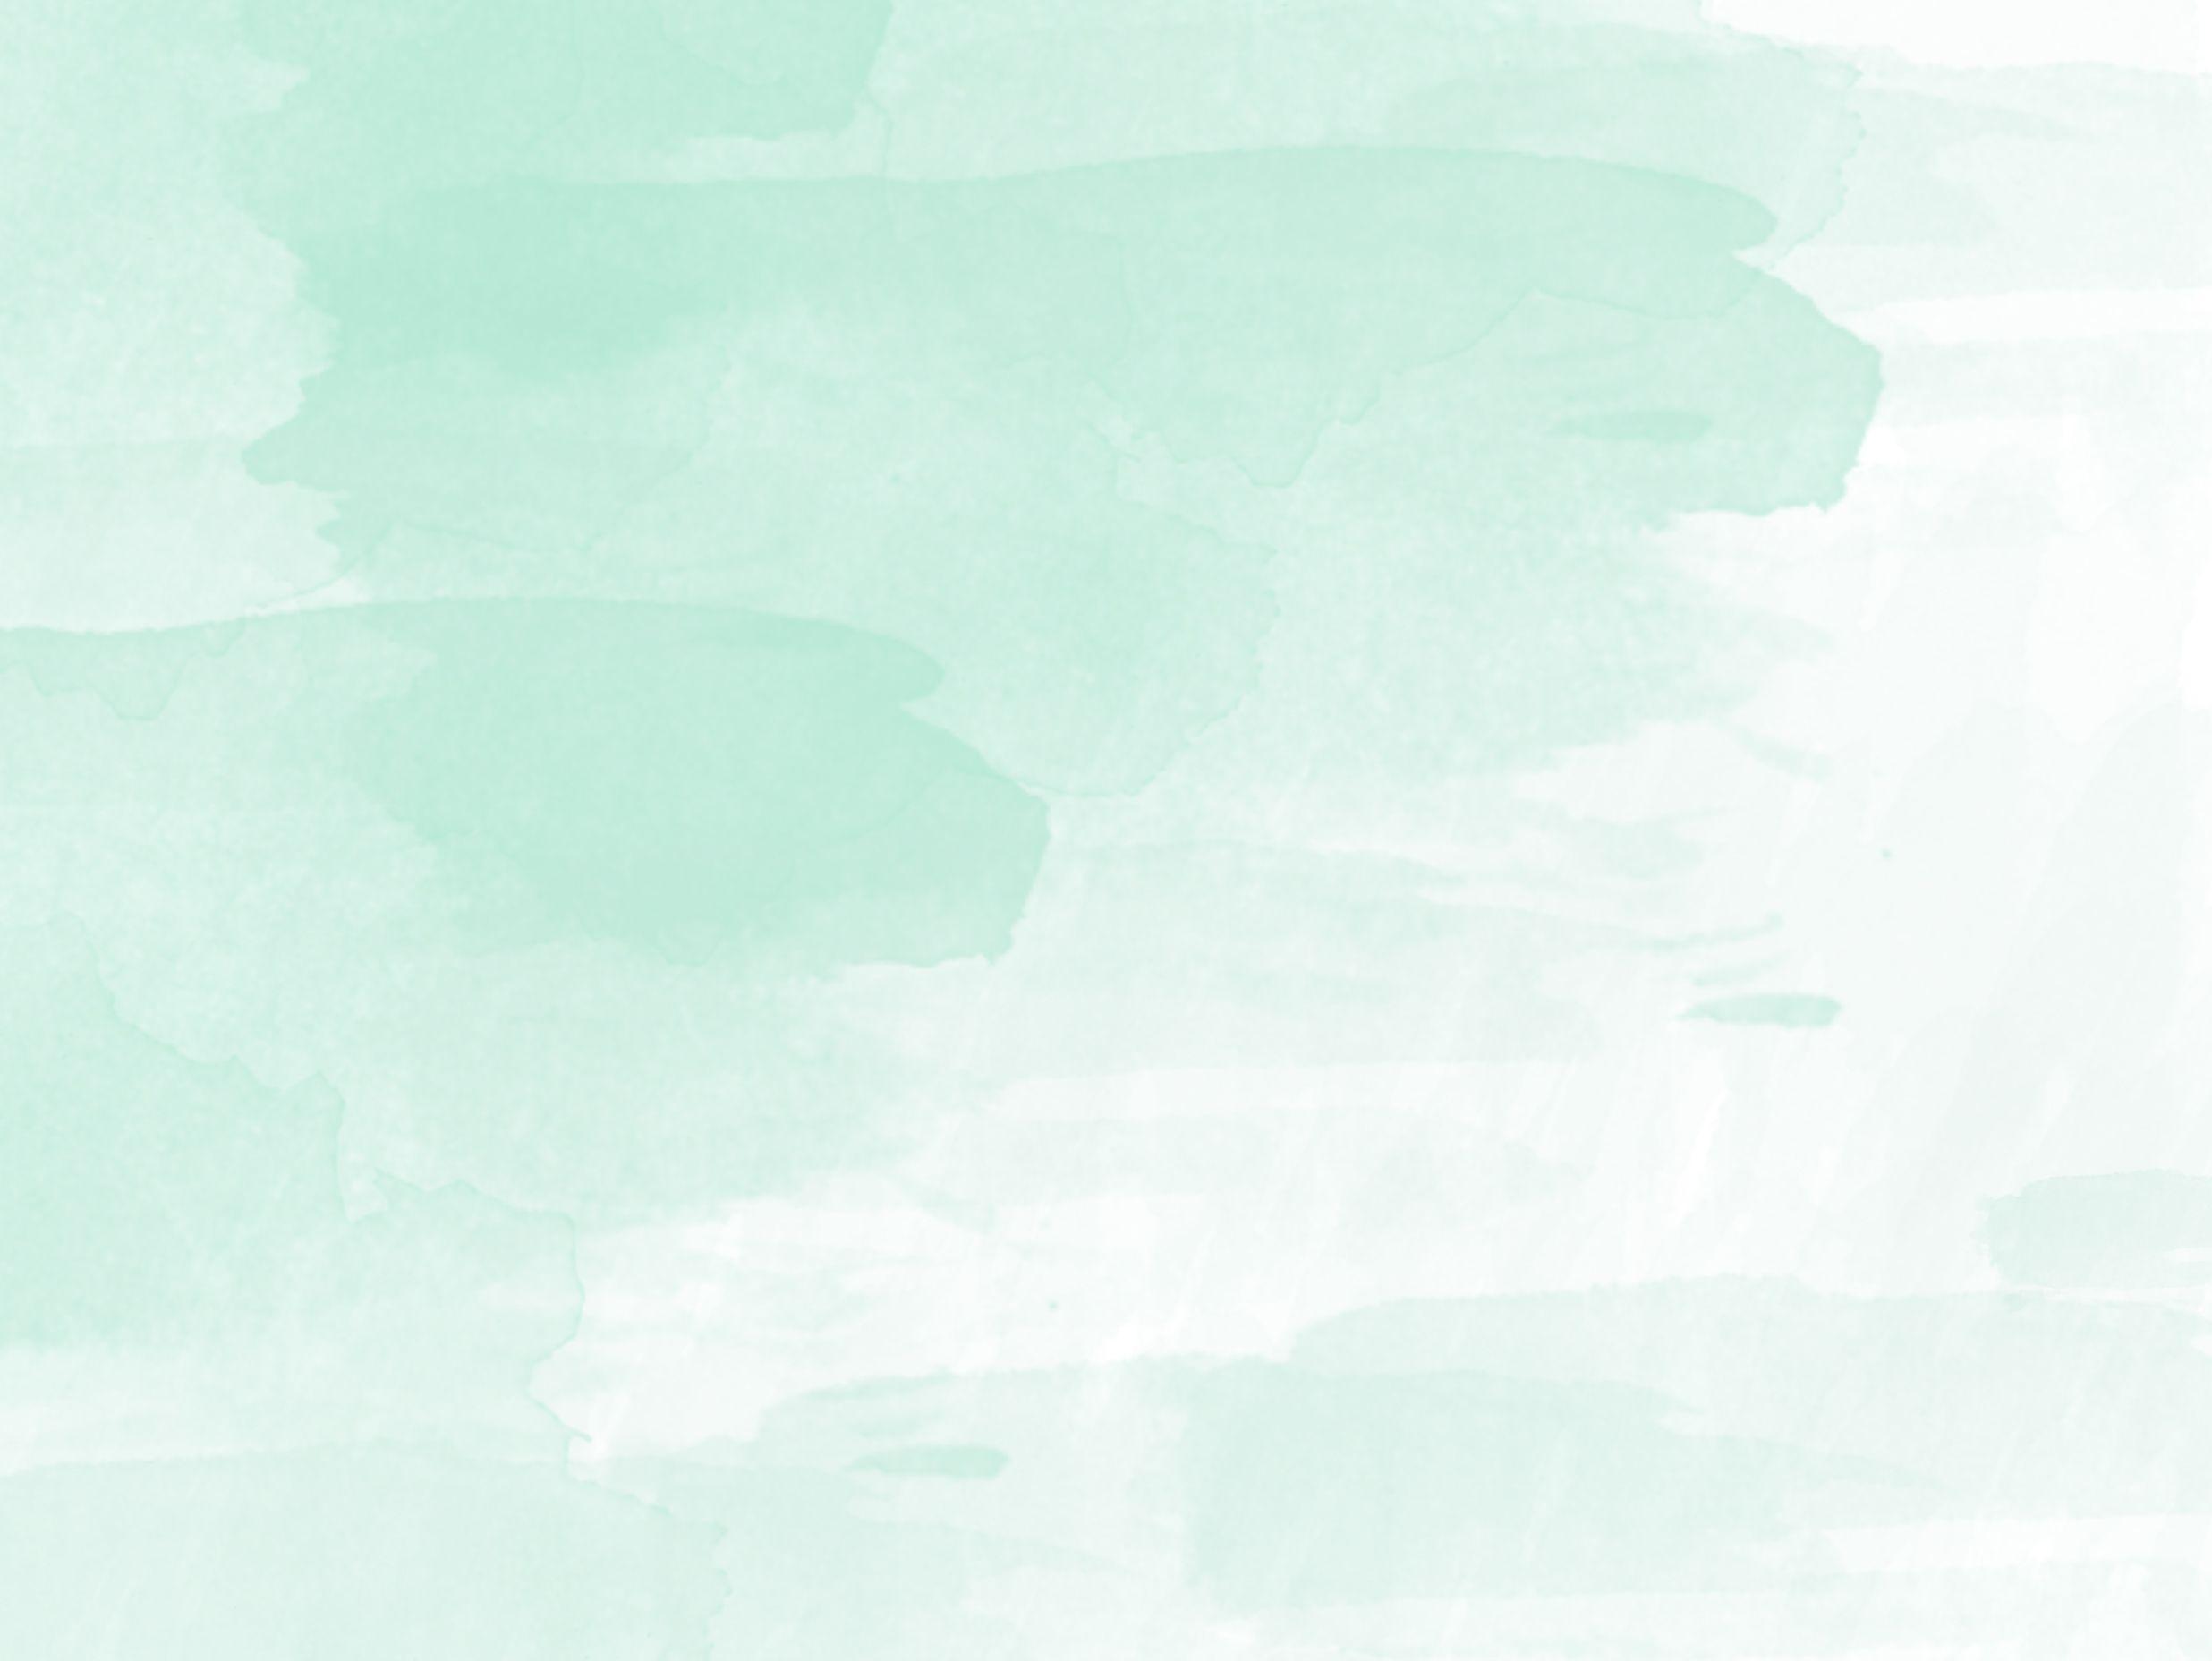 Pastel Watercolor Backgrounds Wallpaper Cave